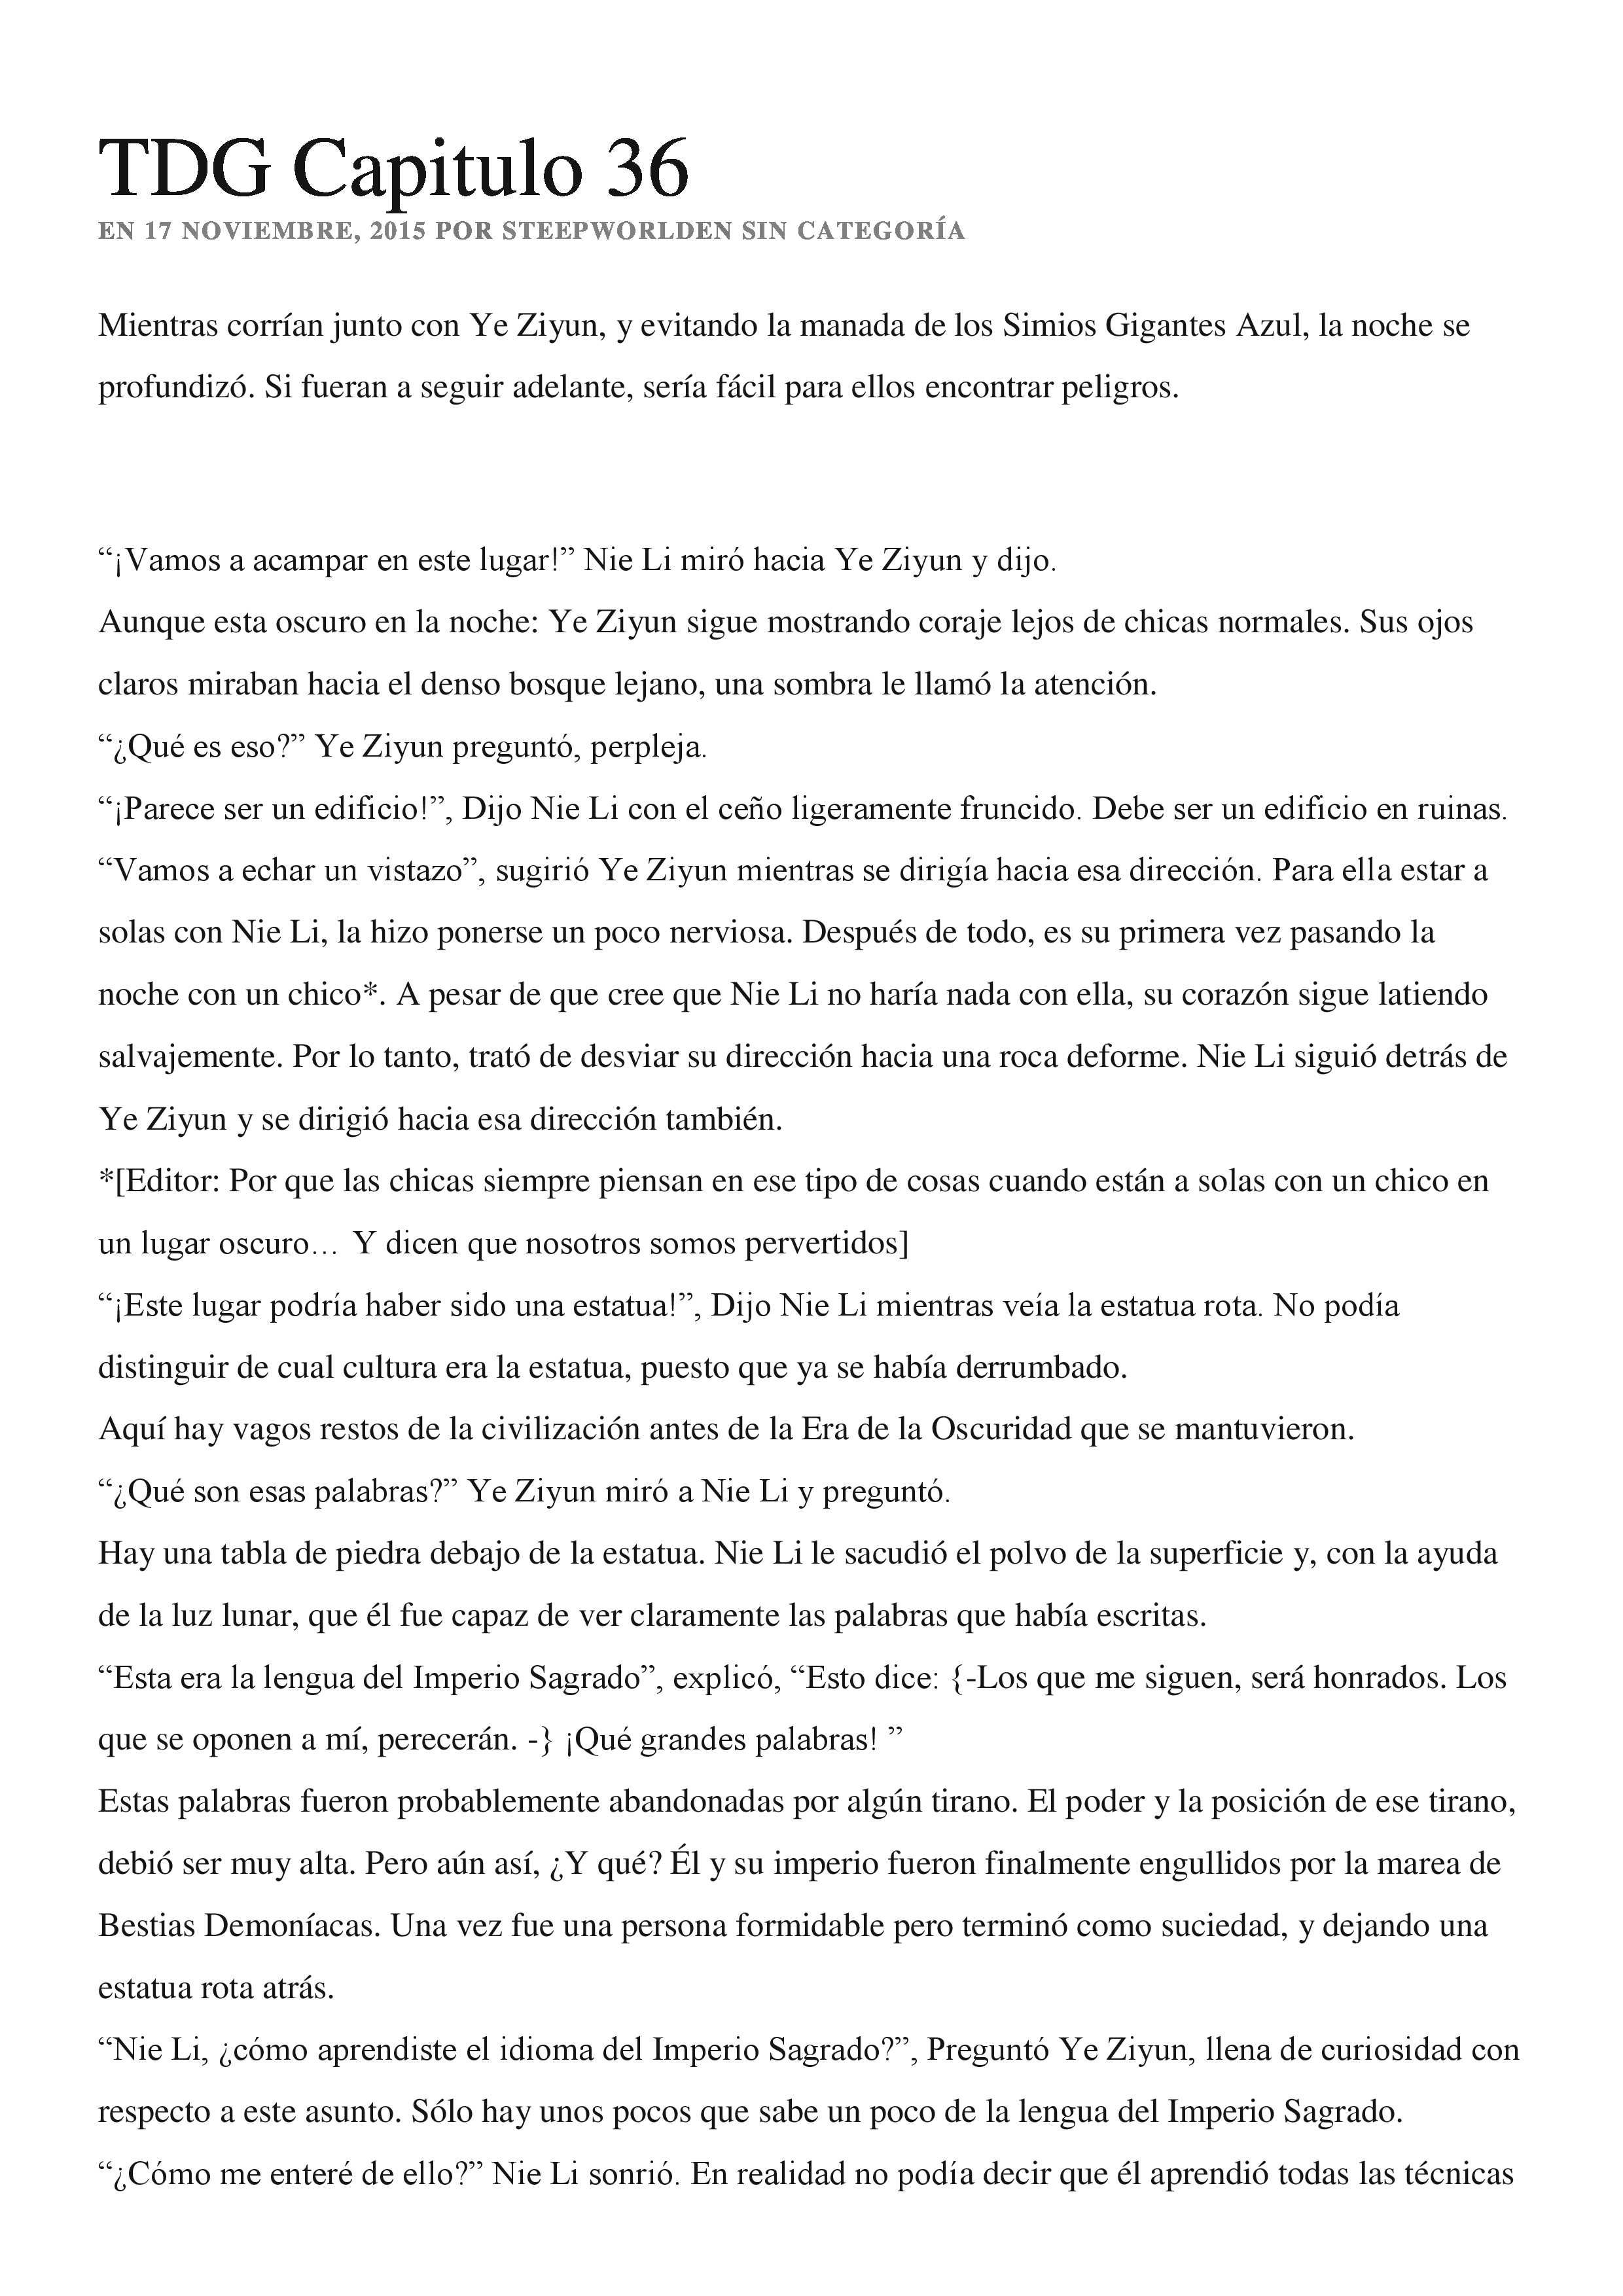 https://c5.ninemanga.com/es_manga/44/20012/487454/030e65da2b1c944090548d36b244b28d.jpg Page 1